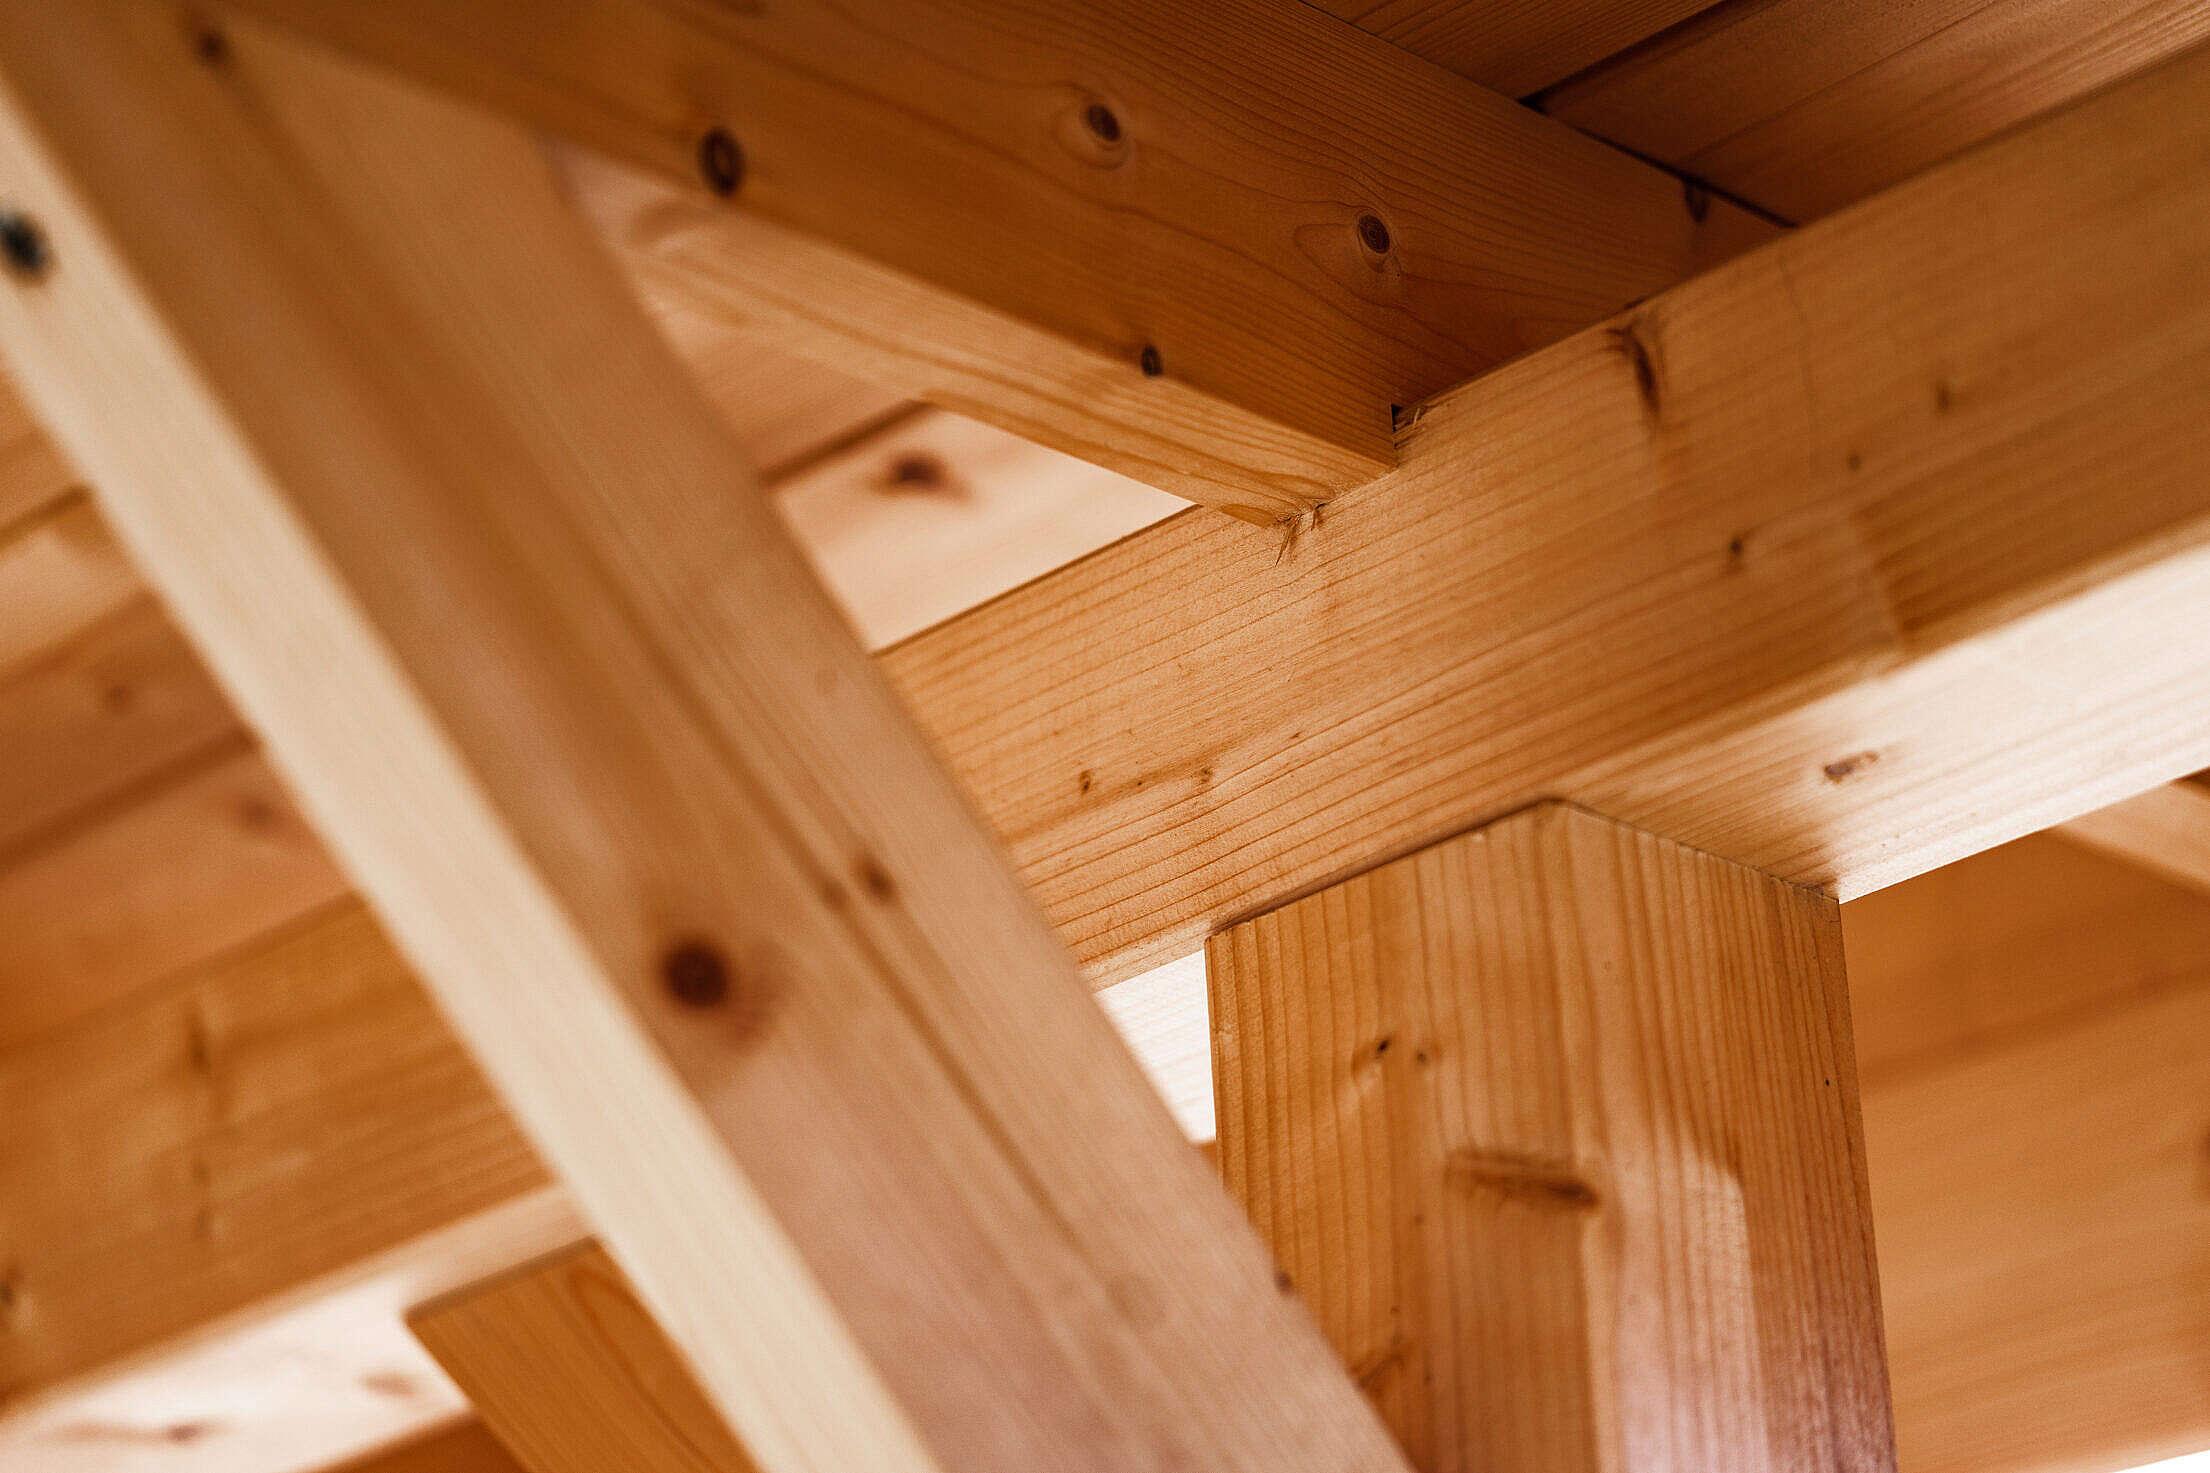 Wooden Beams Close Up Free Stock Photo